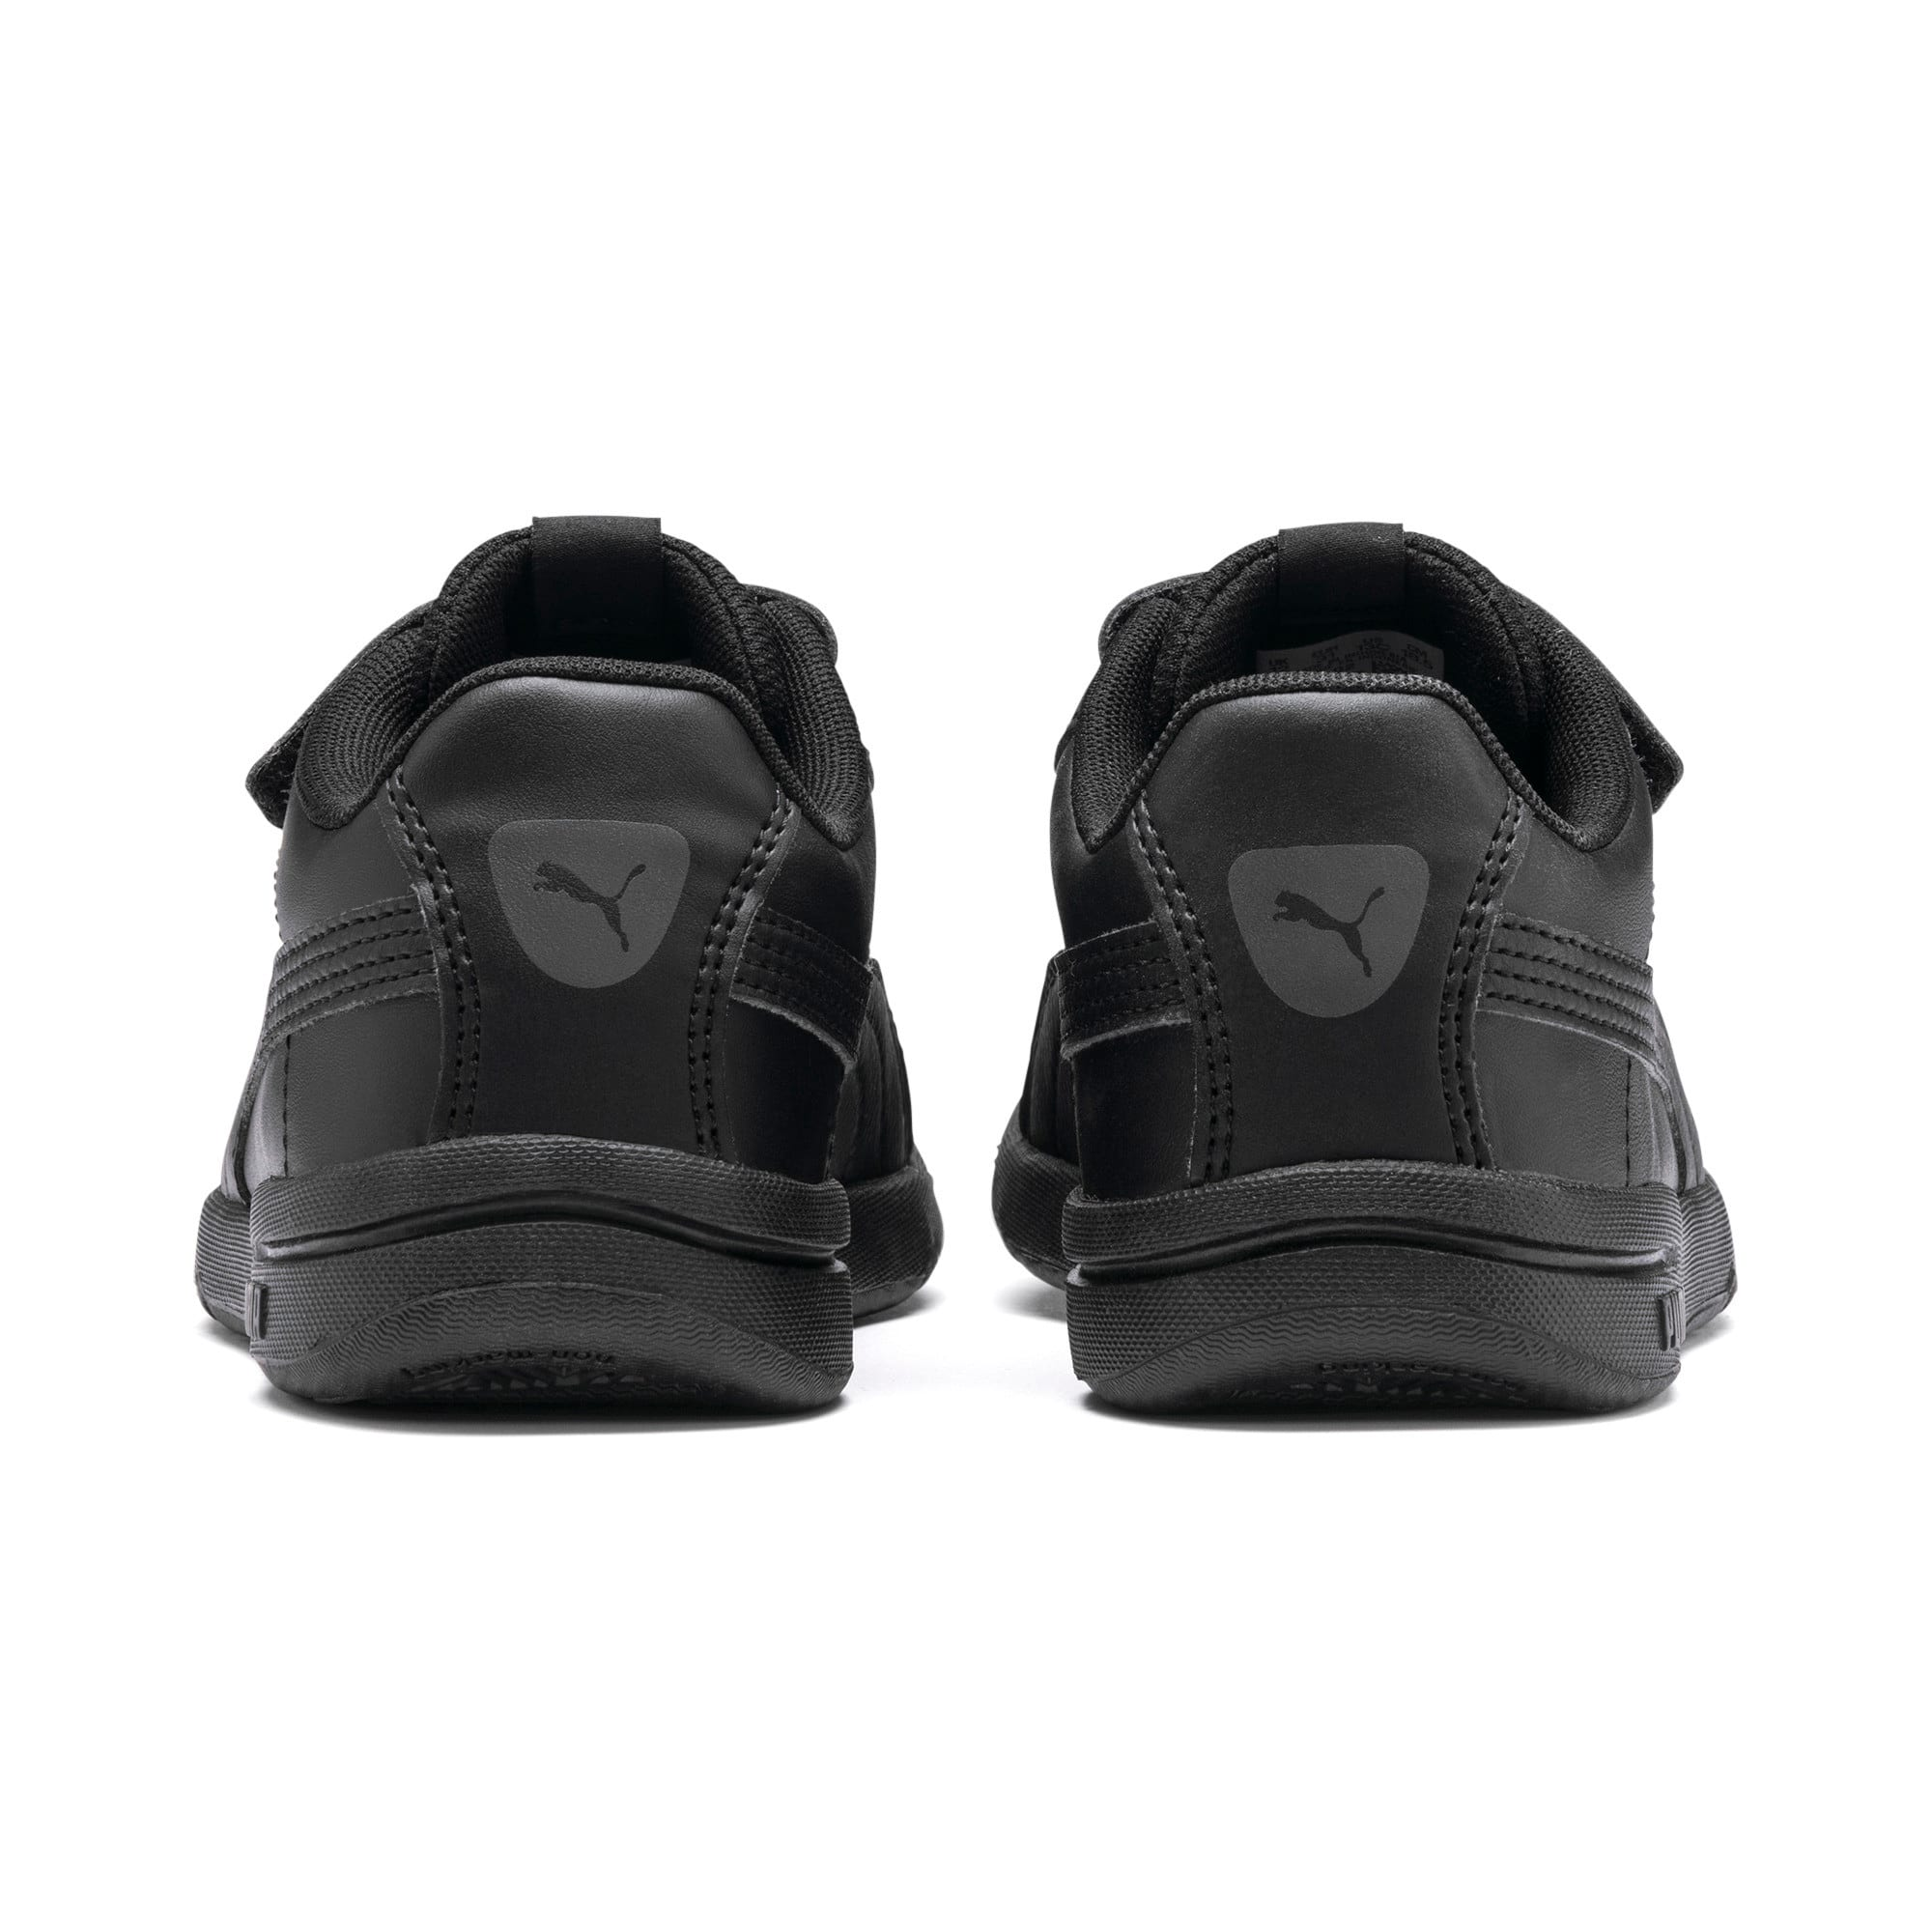 Thumbnail 3 of Stepfleex 2 SL VE V Kids Sneaker, Puma Black-Puma Black, medium